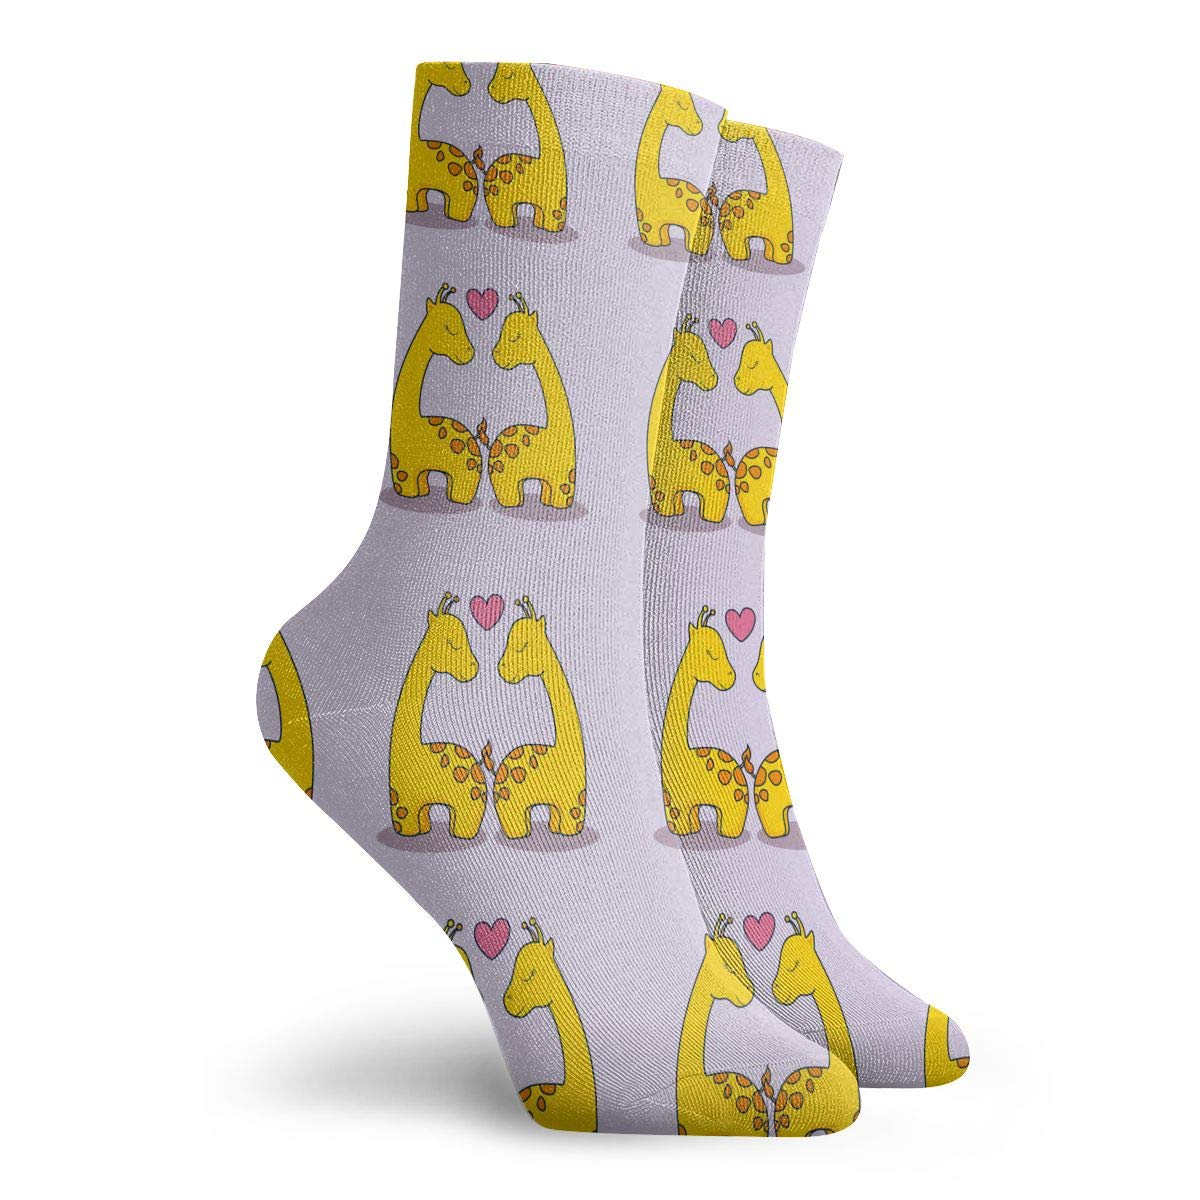 Unisex Love With Cute Giraffe Athletic Quarter Ankle Print Breathable Hiking Running Socks